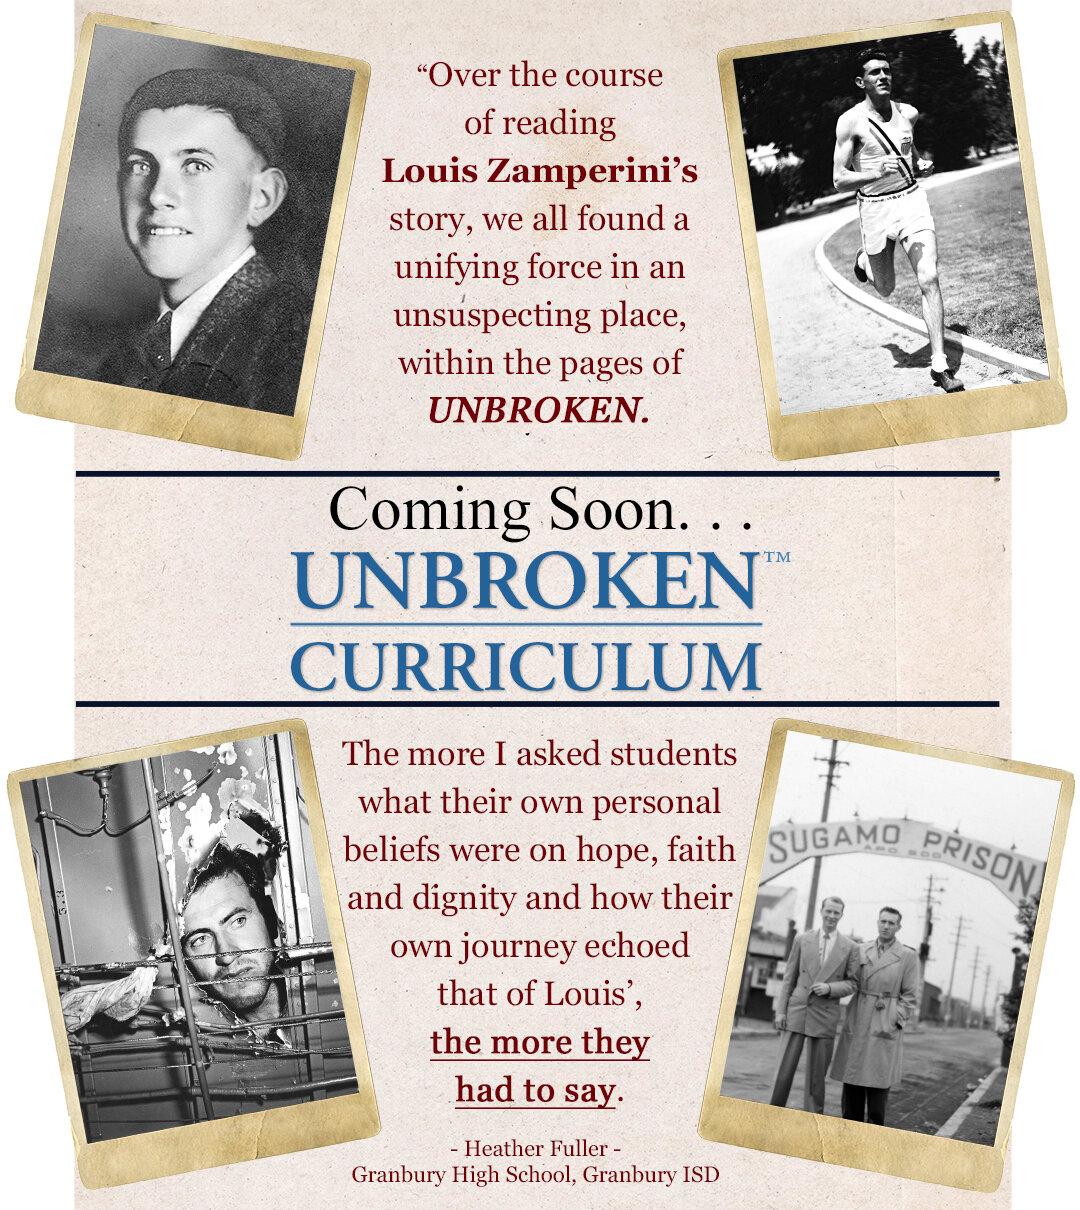 Unbroken Curriculum Introduction V3.jpg